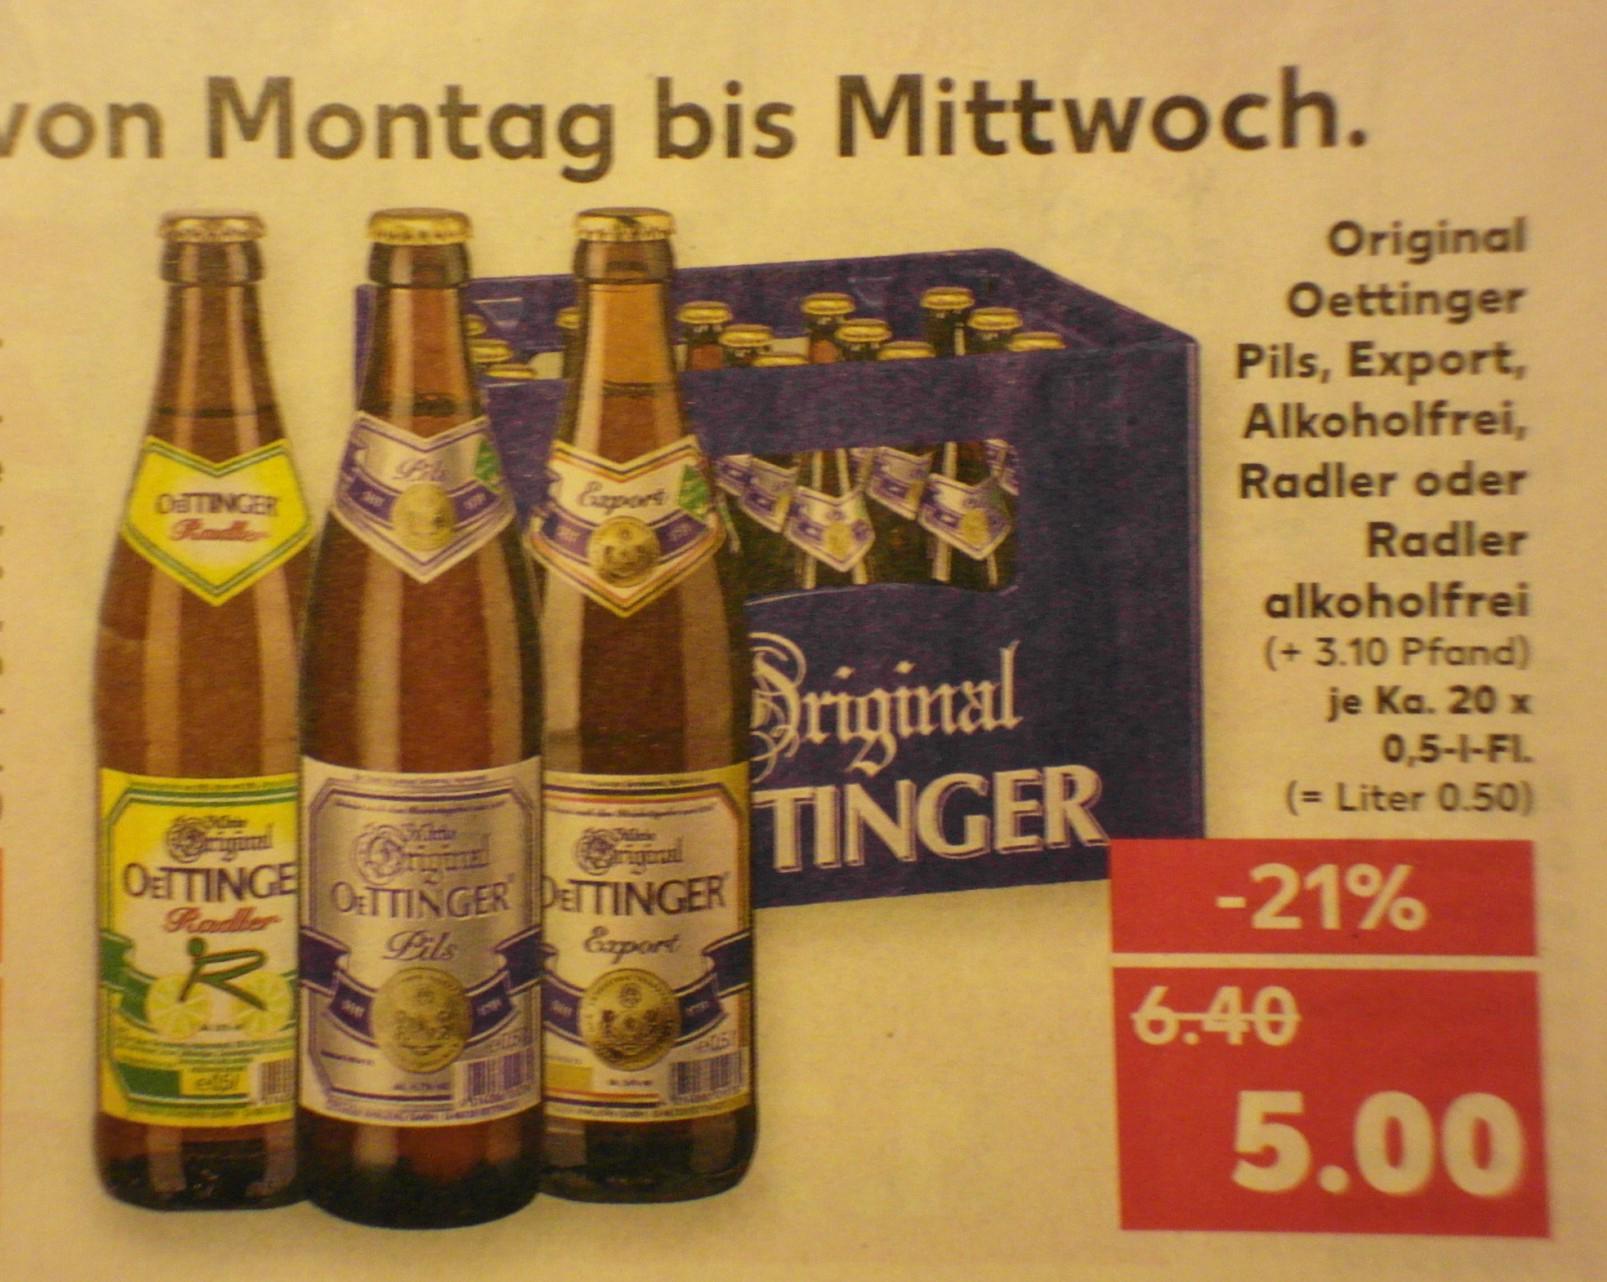 [Kaufland] Oettinger Pils, Export, Alkoholfrei, Radler oder Radler alkoholfrei, der Kasten 5 Euro